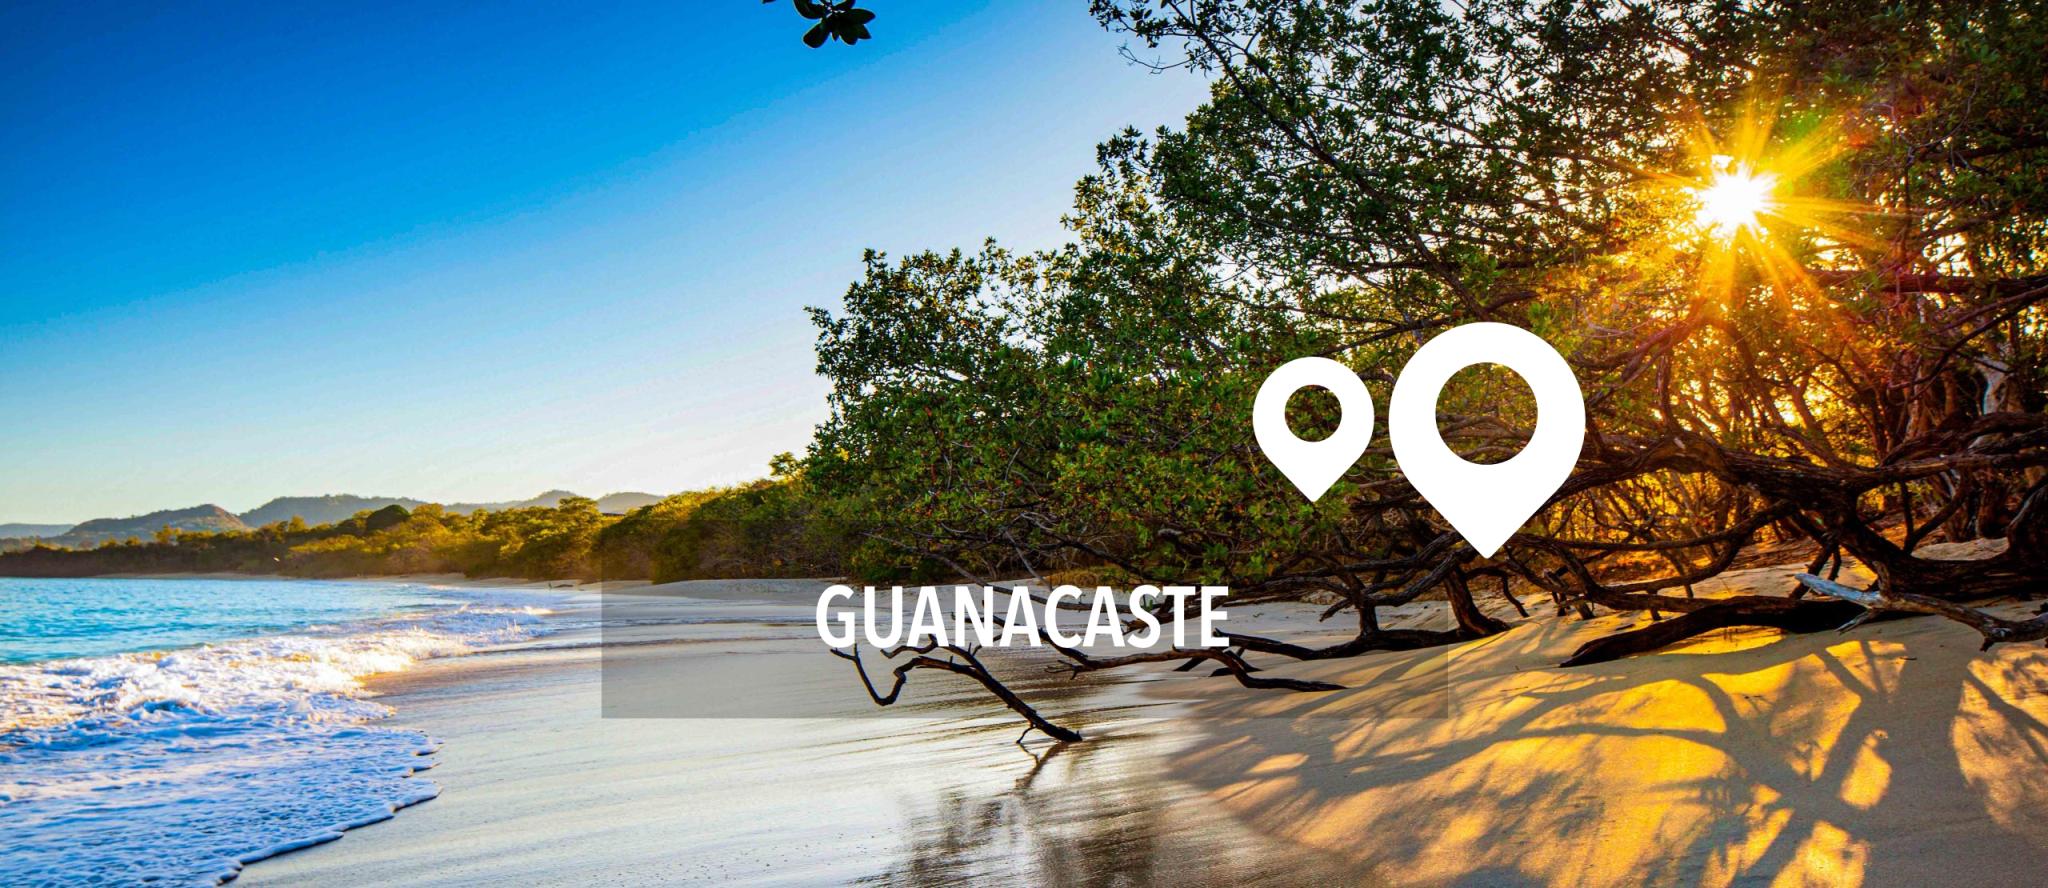 Guanacaste Province of Costa Rica